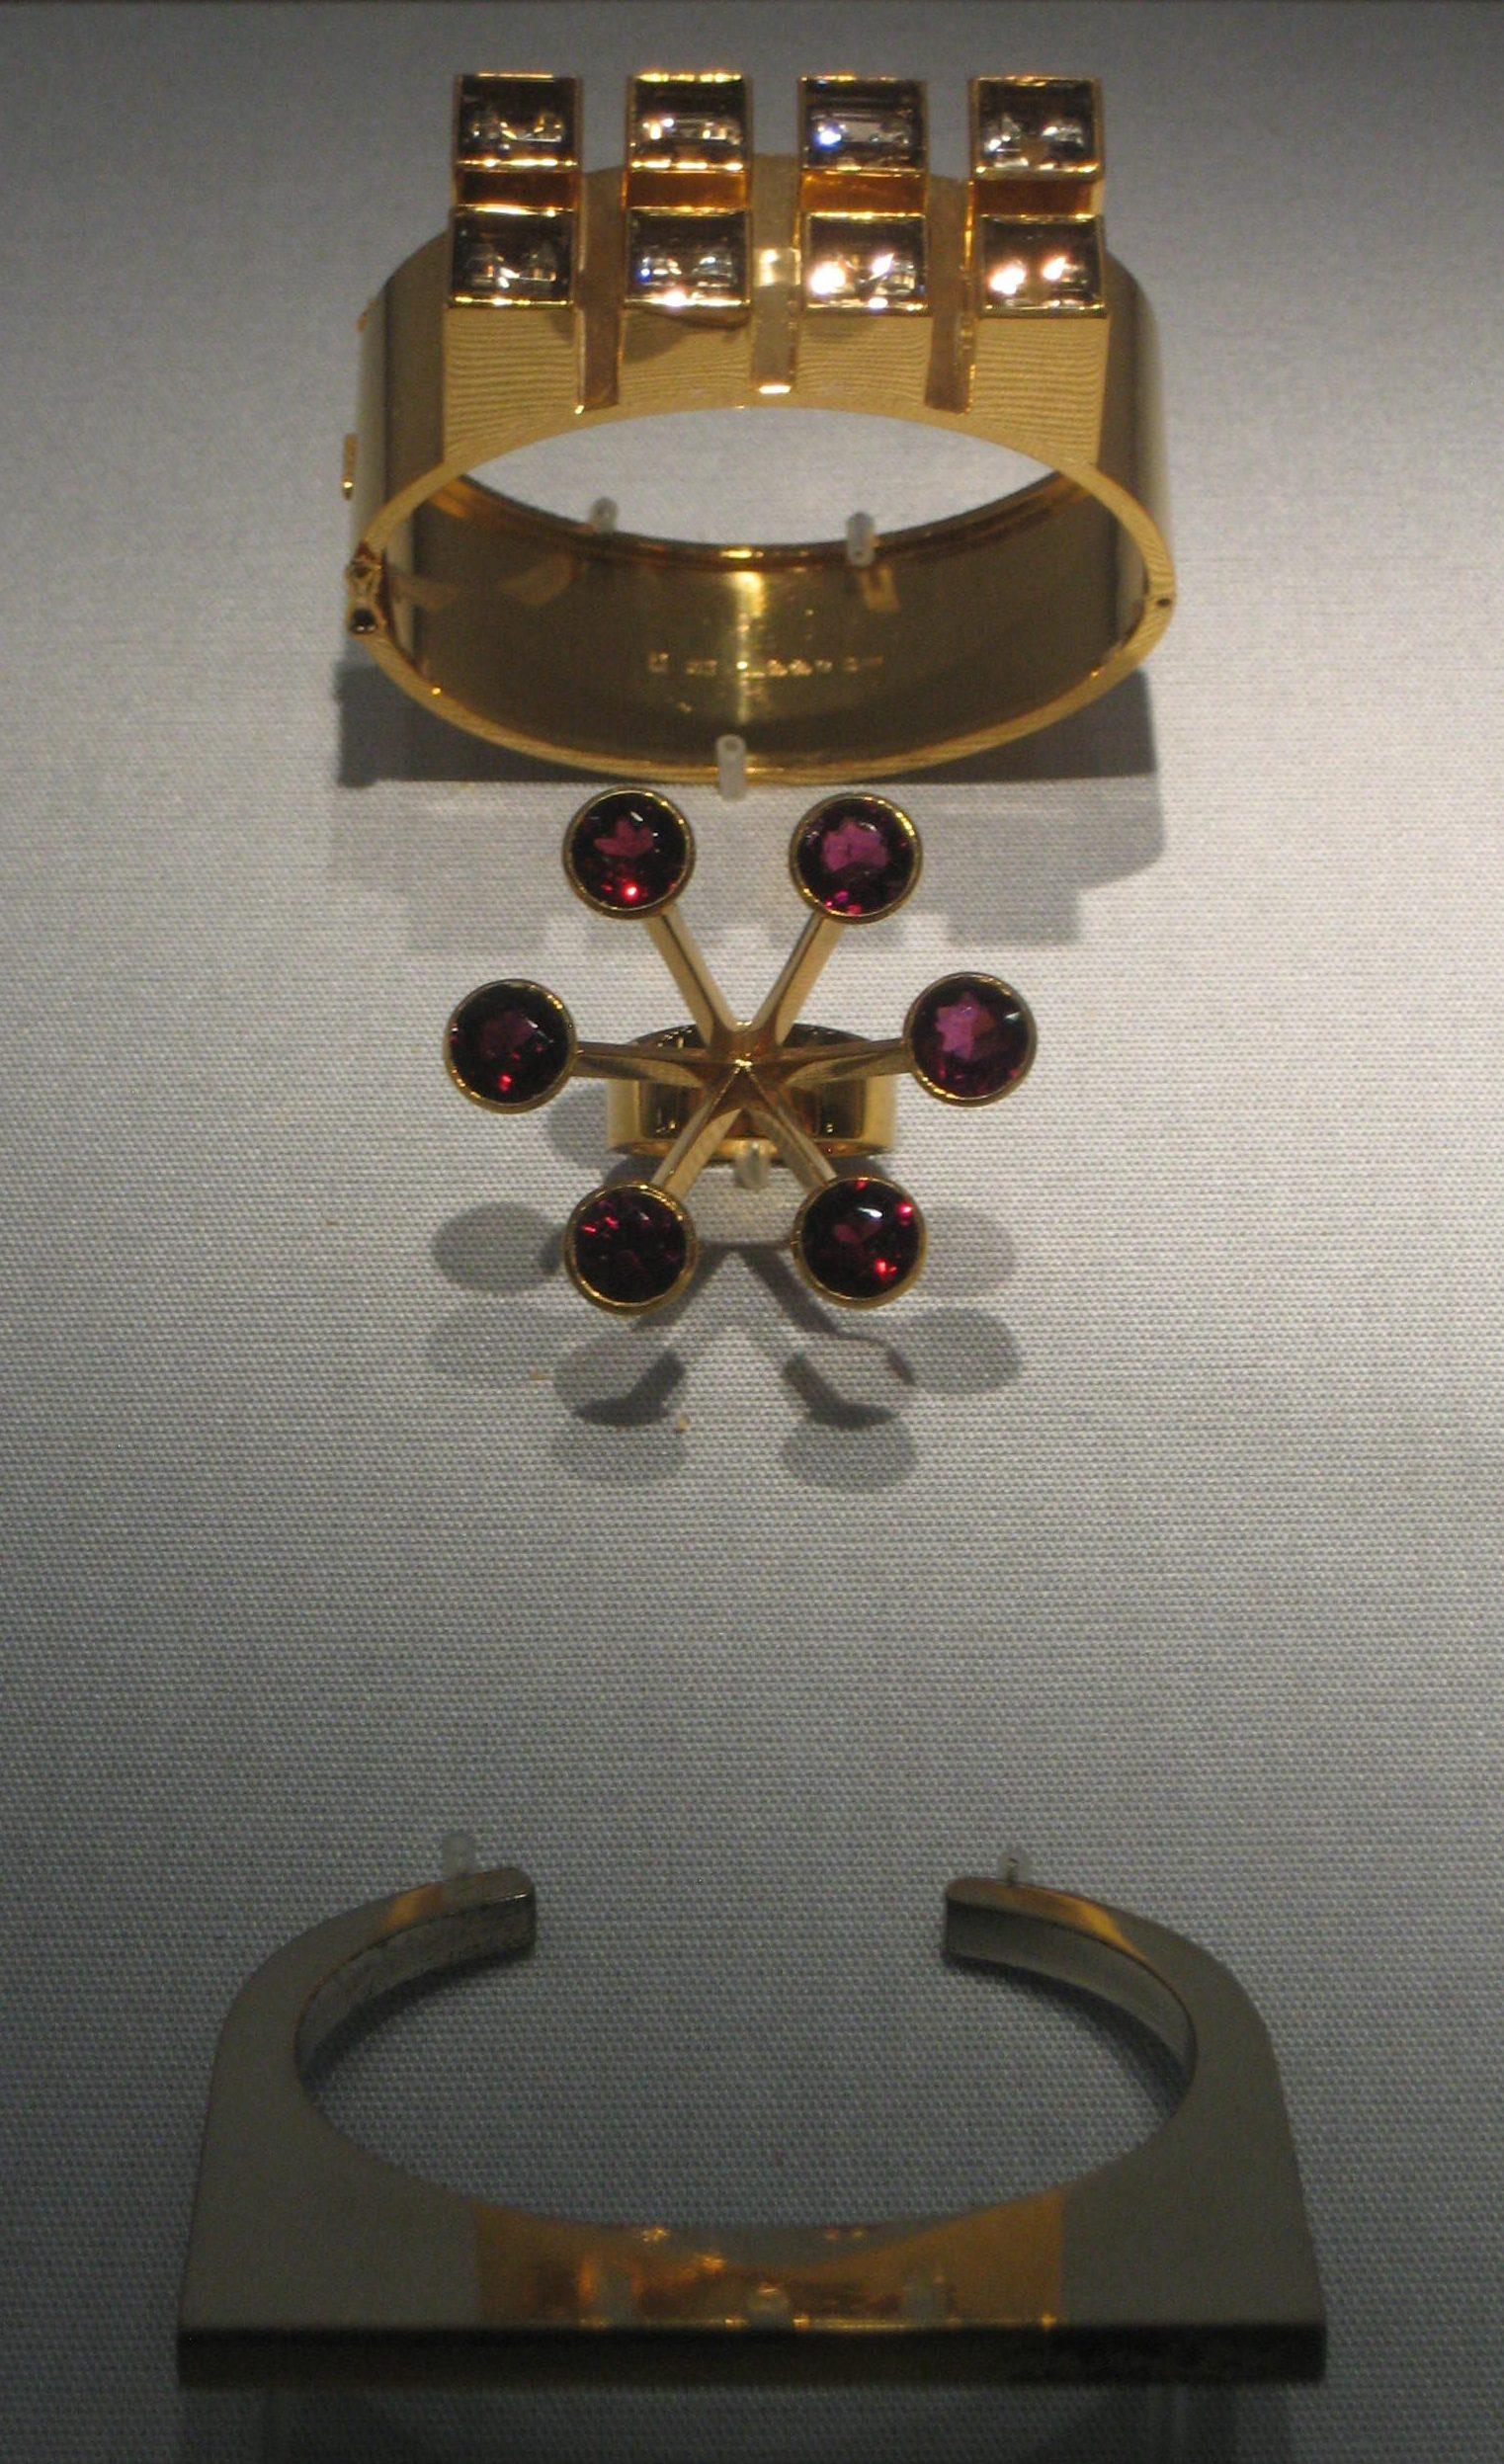 Sigurd Persson, armbanden, ring, 1963. Collectie Schmuckmuseum Pforzheim. Foto Coert Peter Krabbe, mei 2019